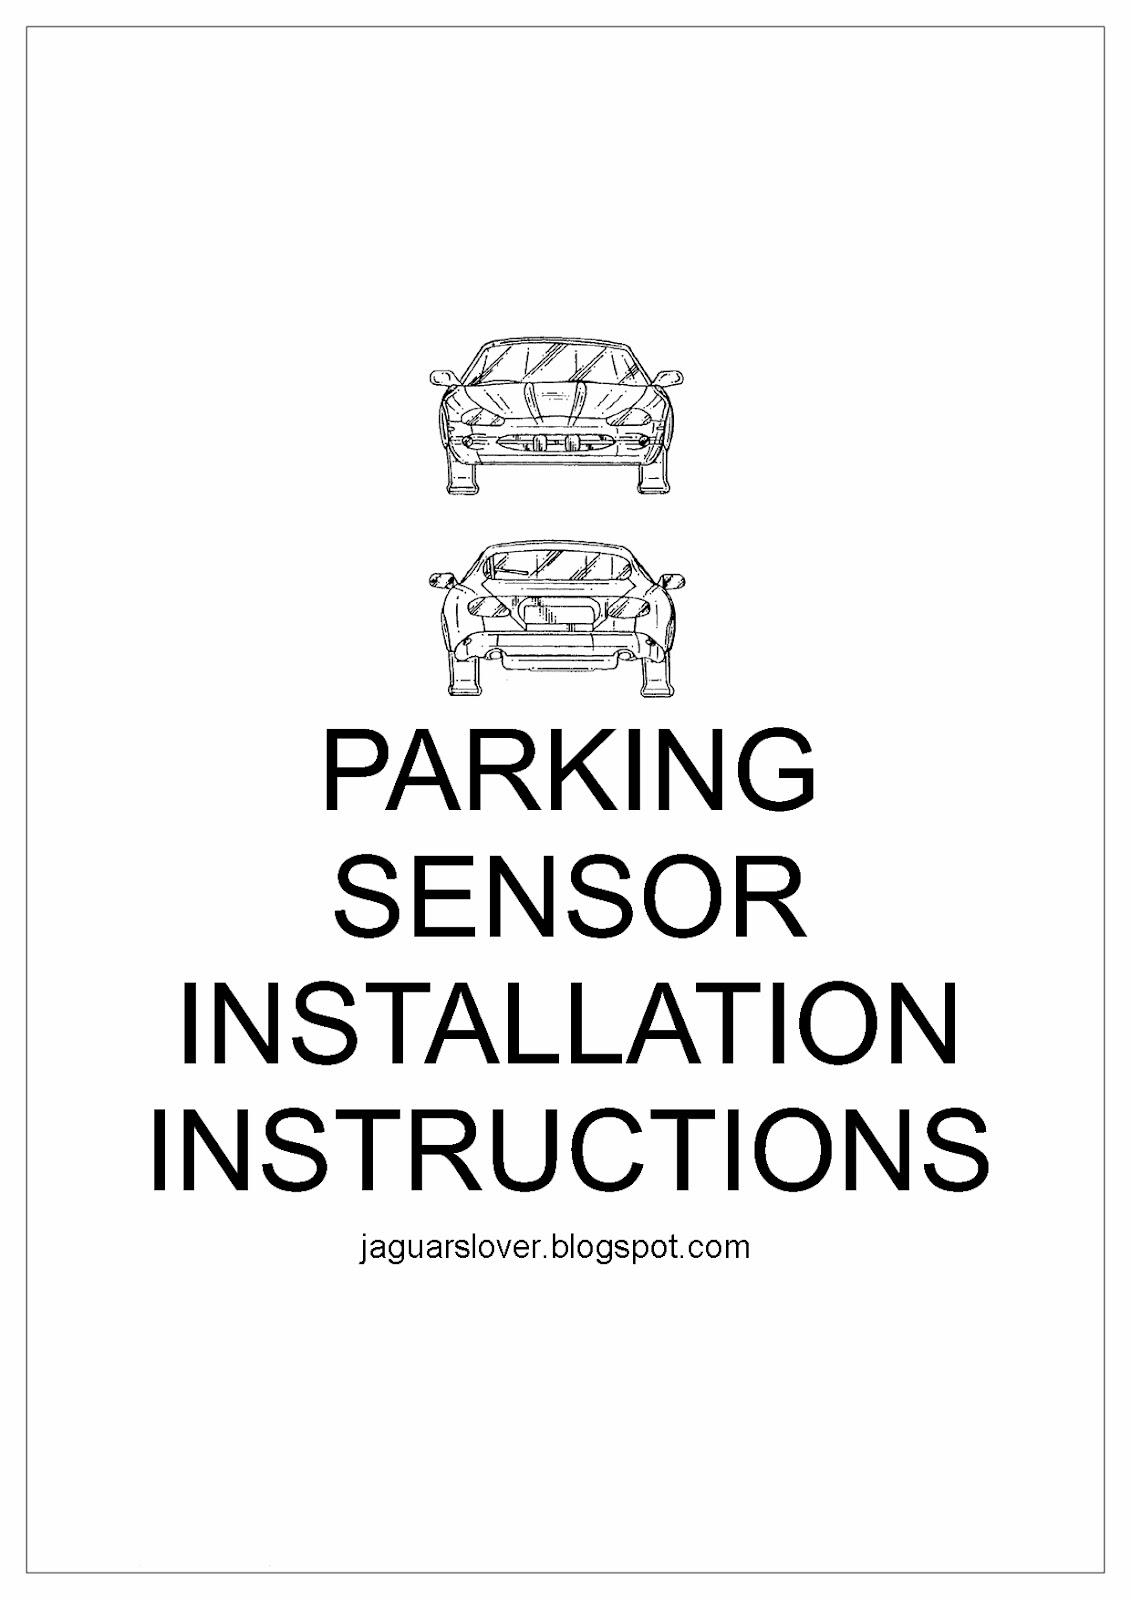 Jaguar Cars Jaguar Bumpers Fitting Parking Sensors